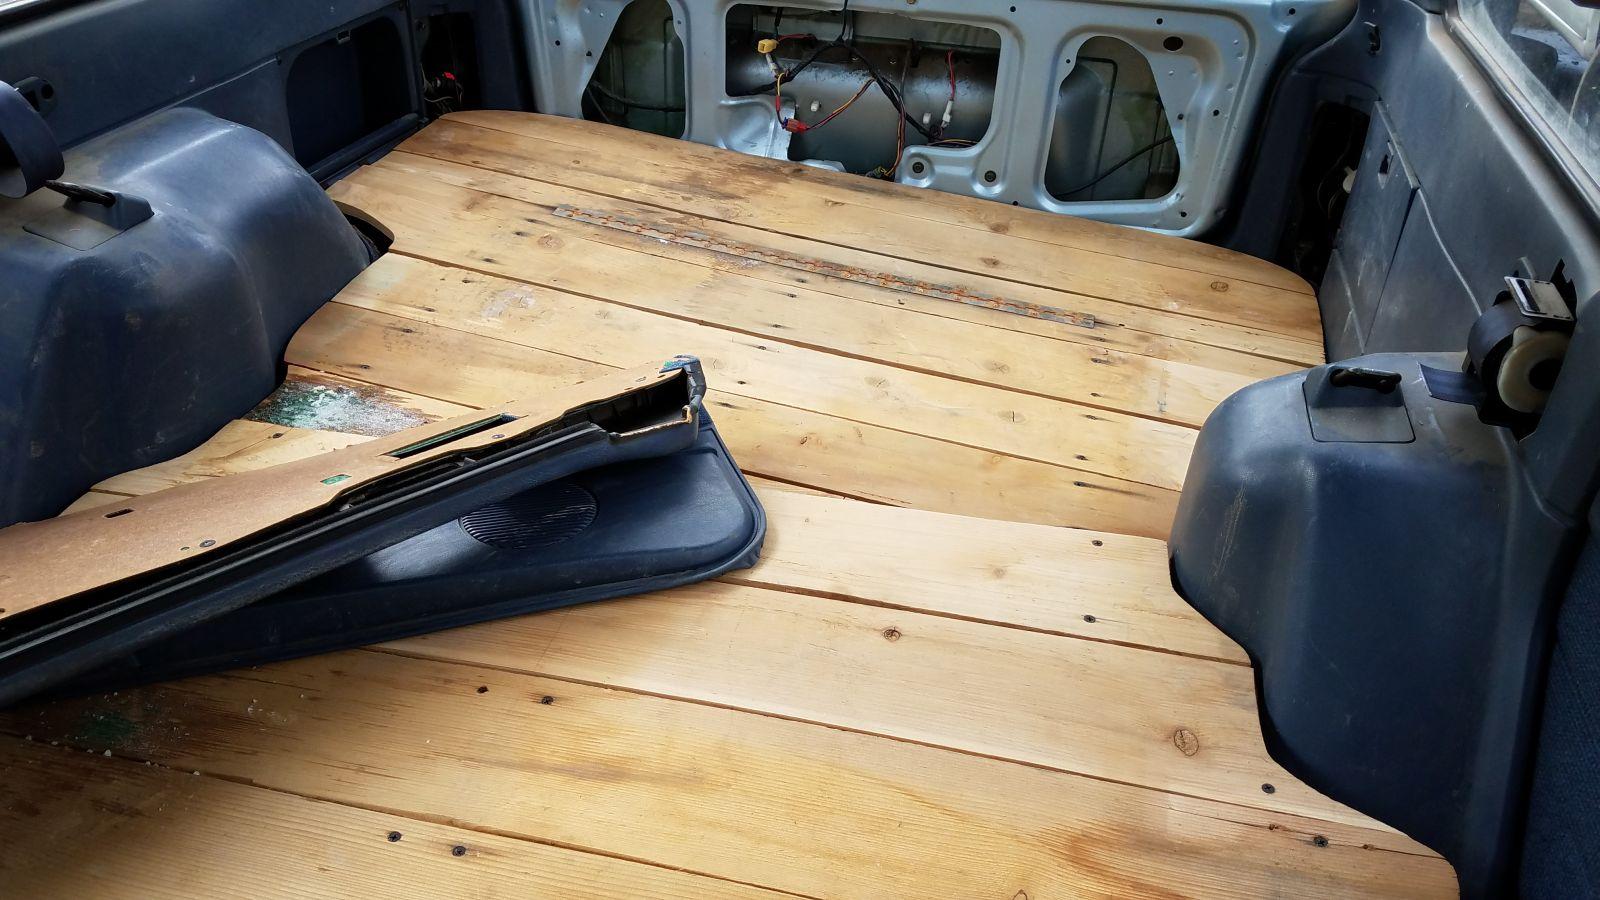 Junkyard Gem 1992 Subaru Loyale Wagon With Budget Cargo